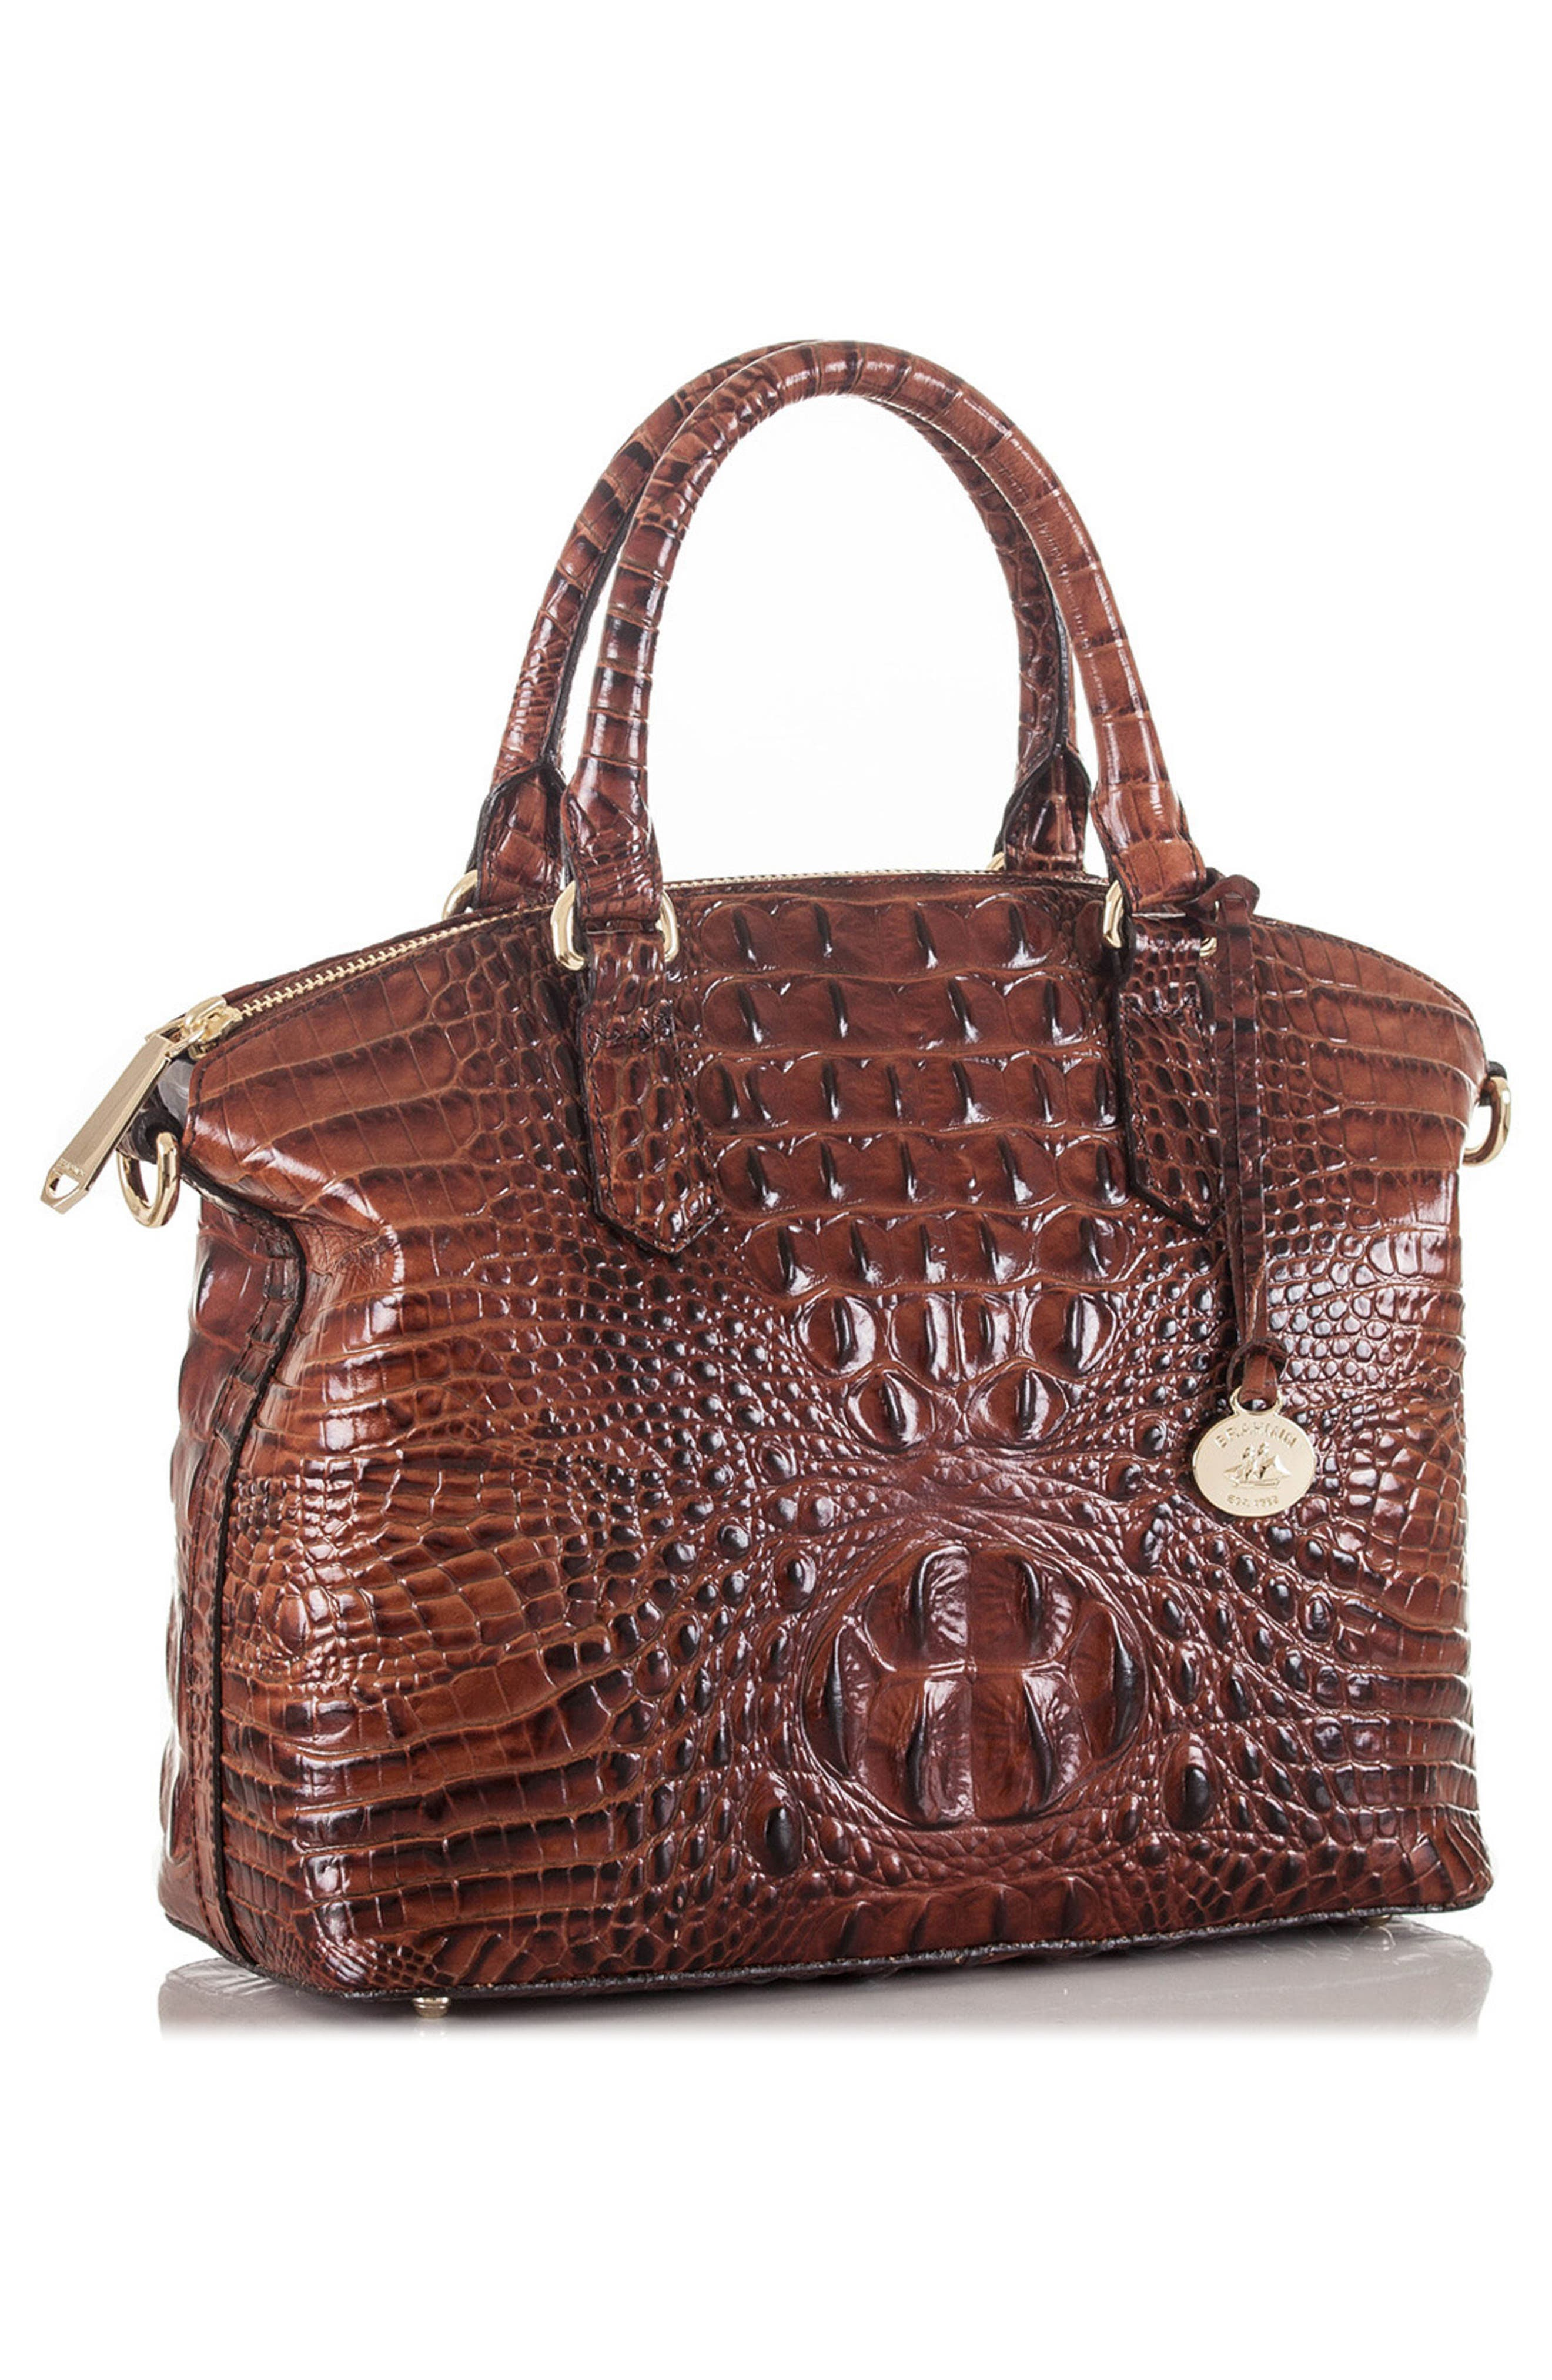 BRAHMIN, 'Medium Duxbury' Croc Embossed Leather Satchel, Alternate thumbnail 5, color, PECAN